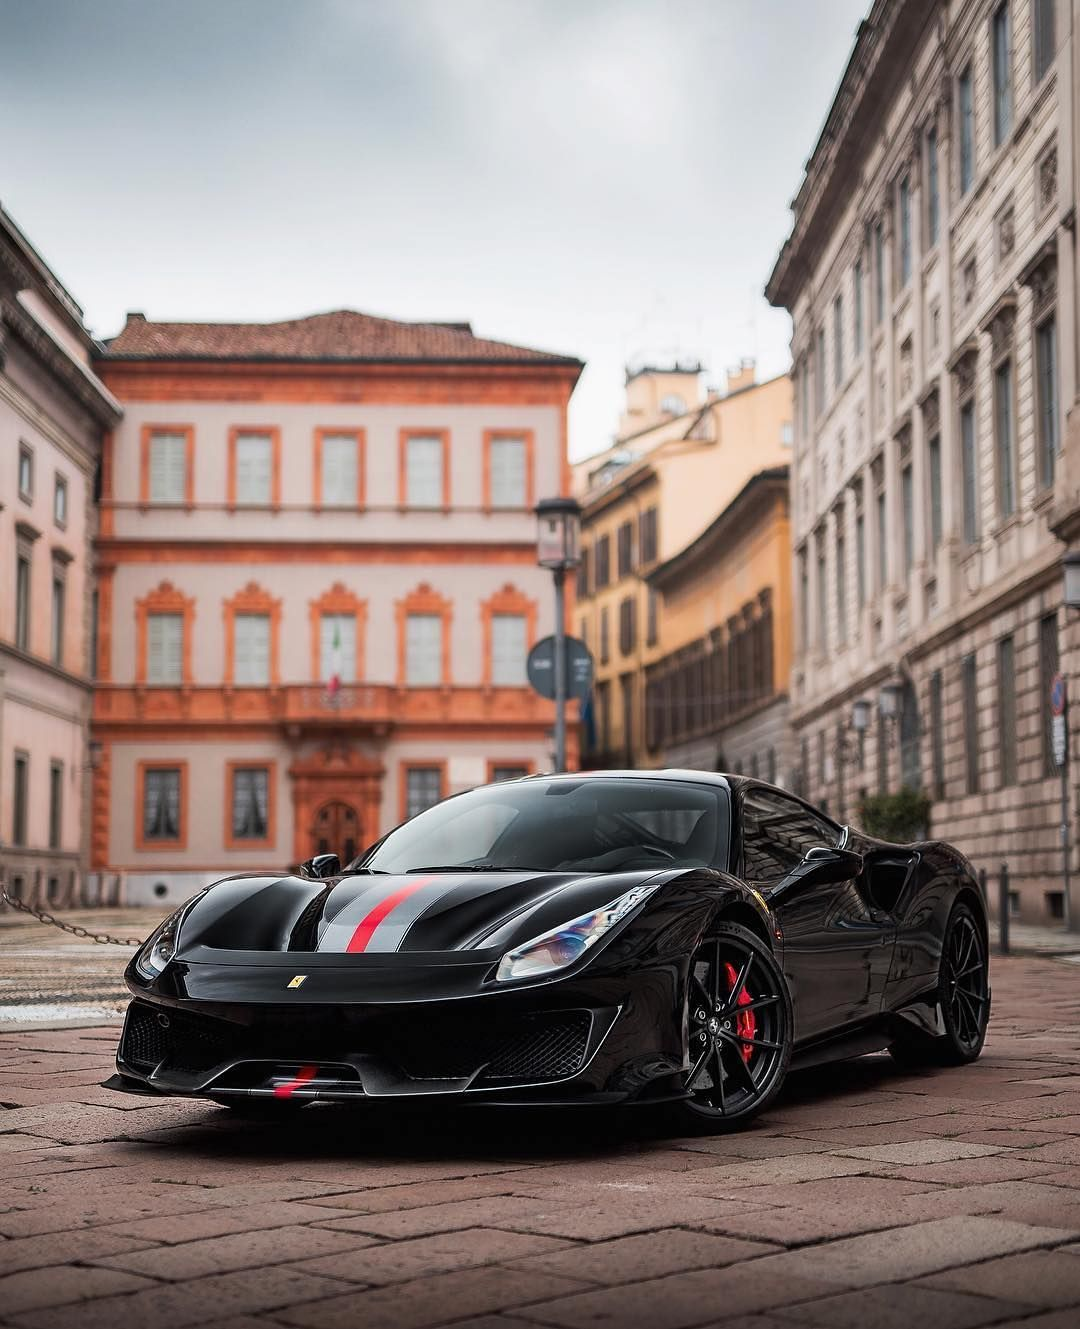 Ferrari Limited Edition On Instagram Ferrari 488pista Black Sports Car Sports Cars Ferrari